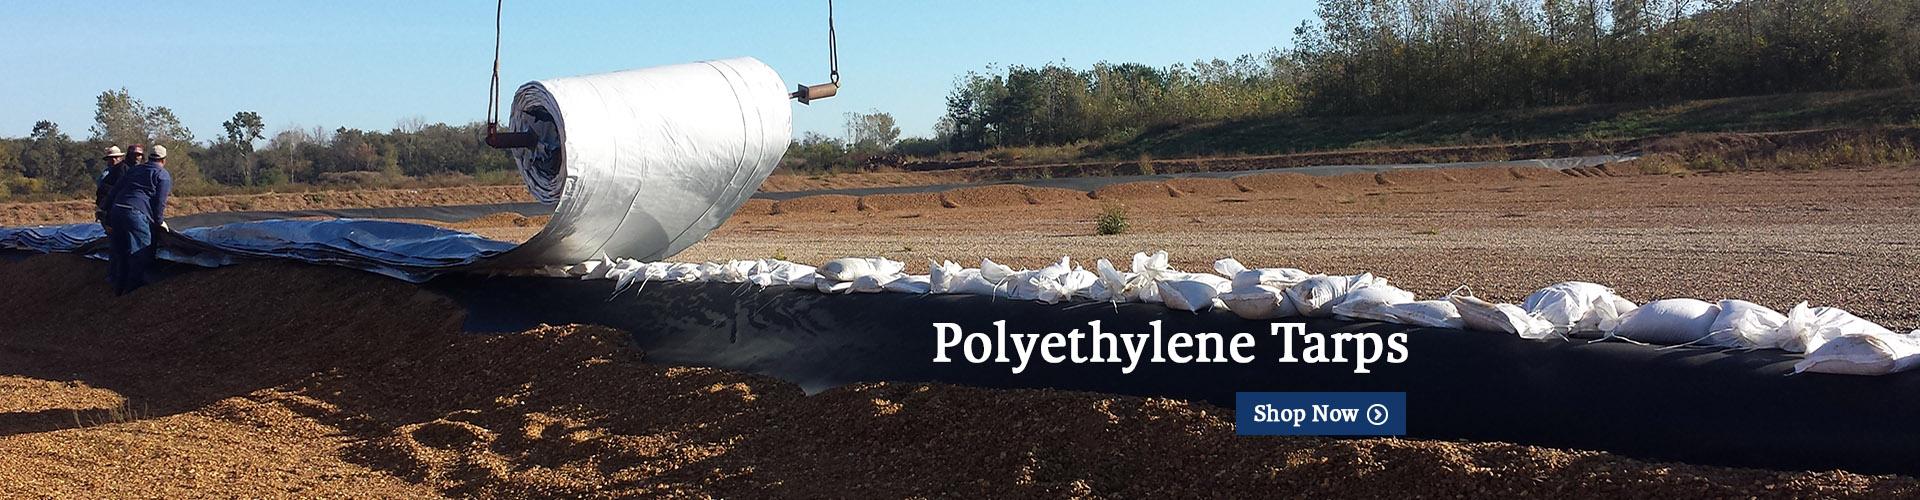 polyethylene tarps